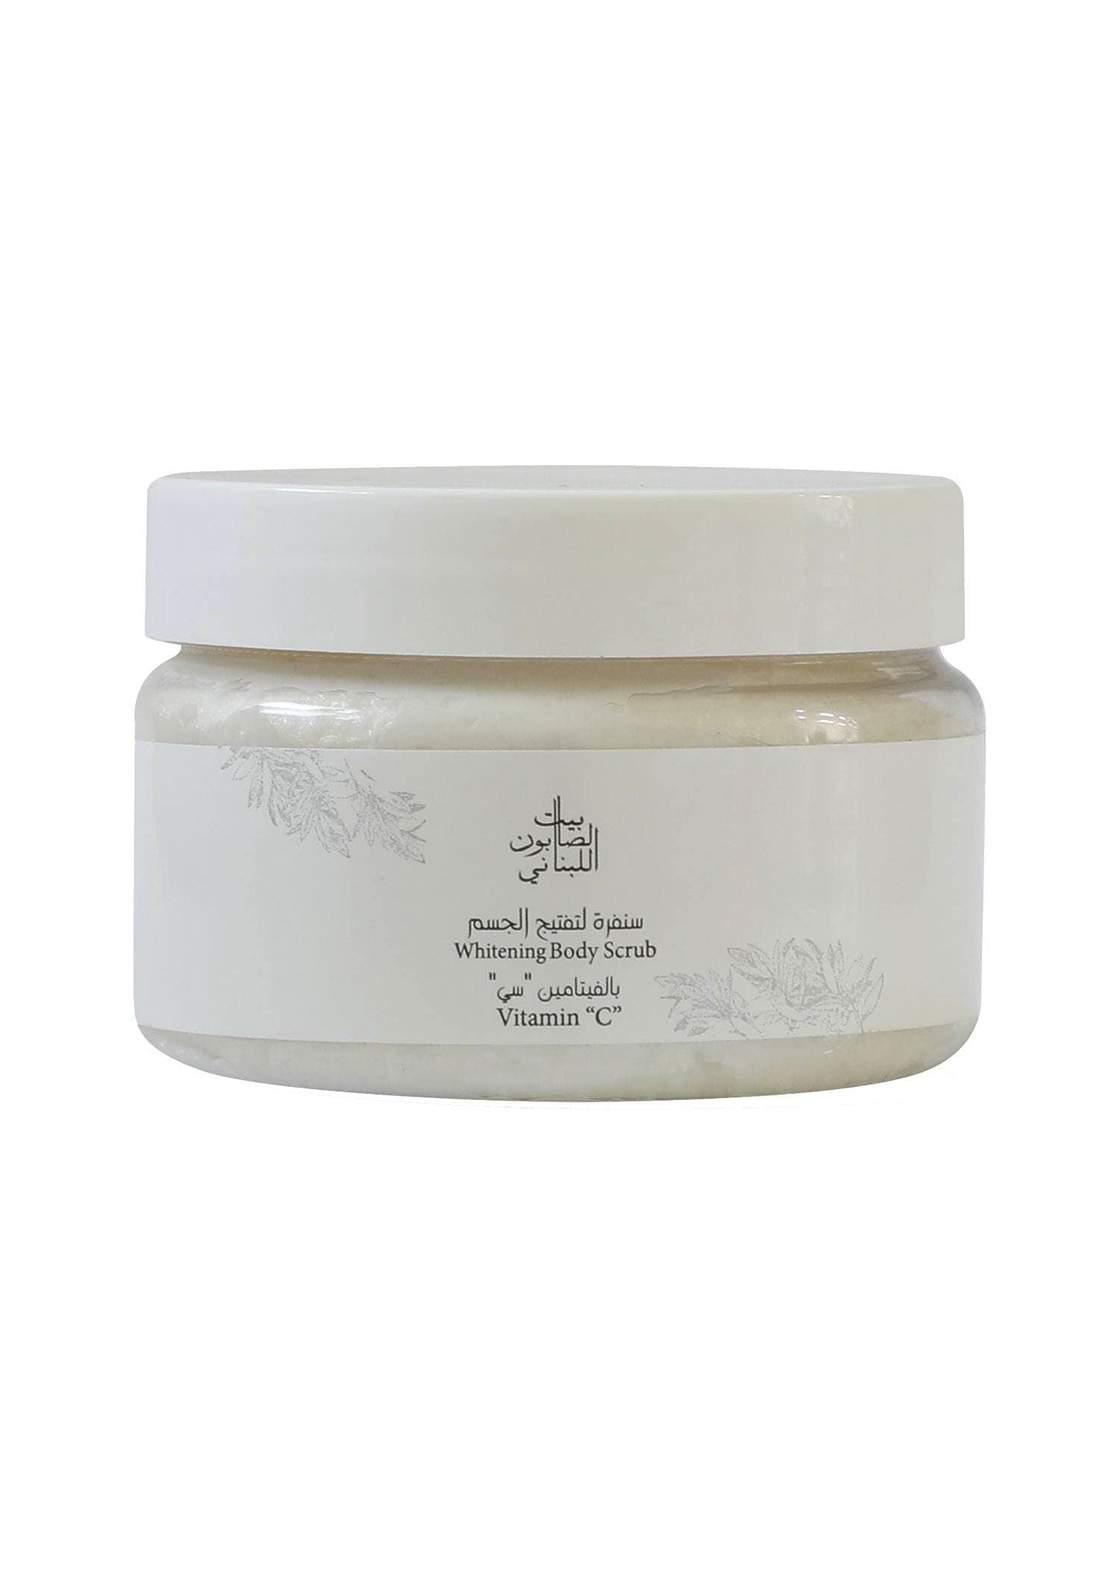 Bayt Alsaboun Alloubnani-317463 Whitening Body Scrub Vitamin C 300g سنفرة